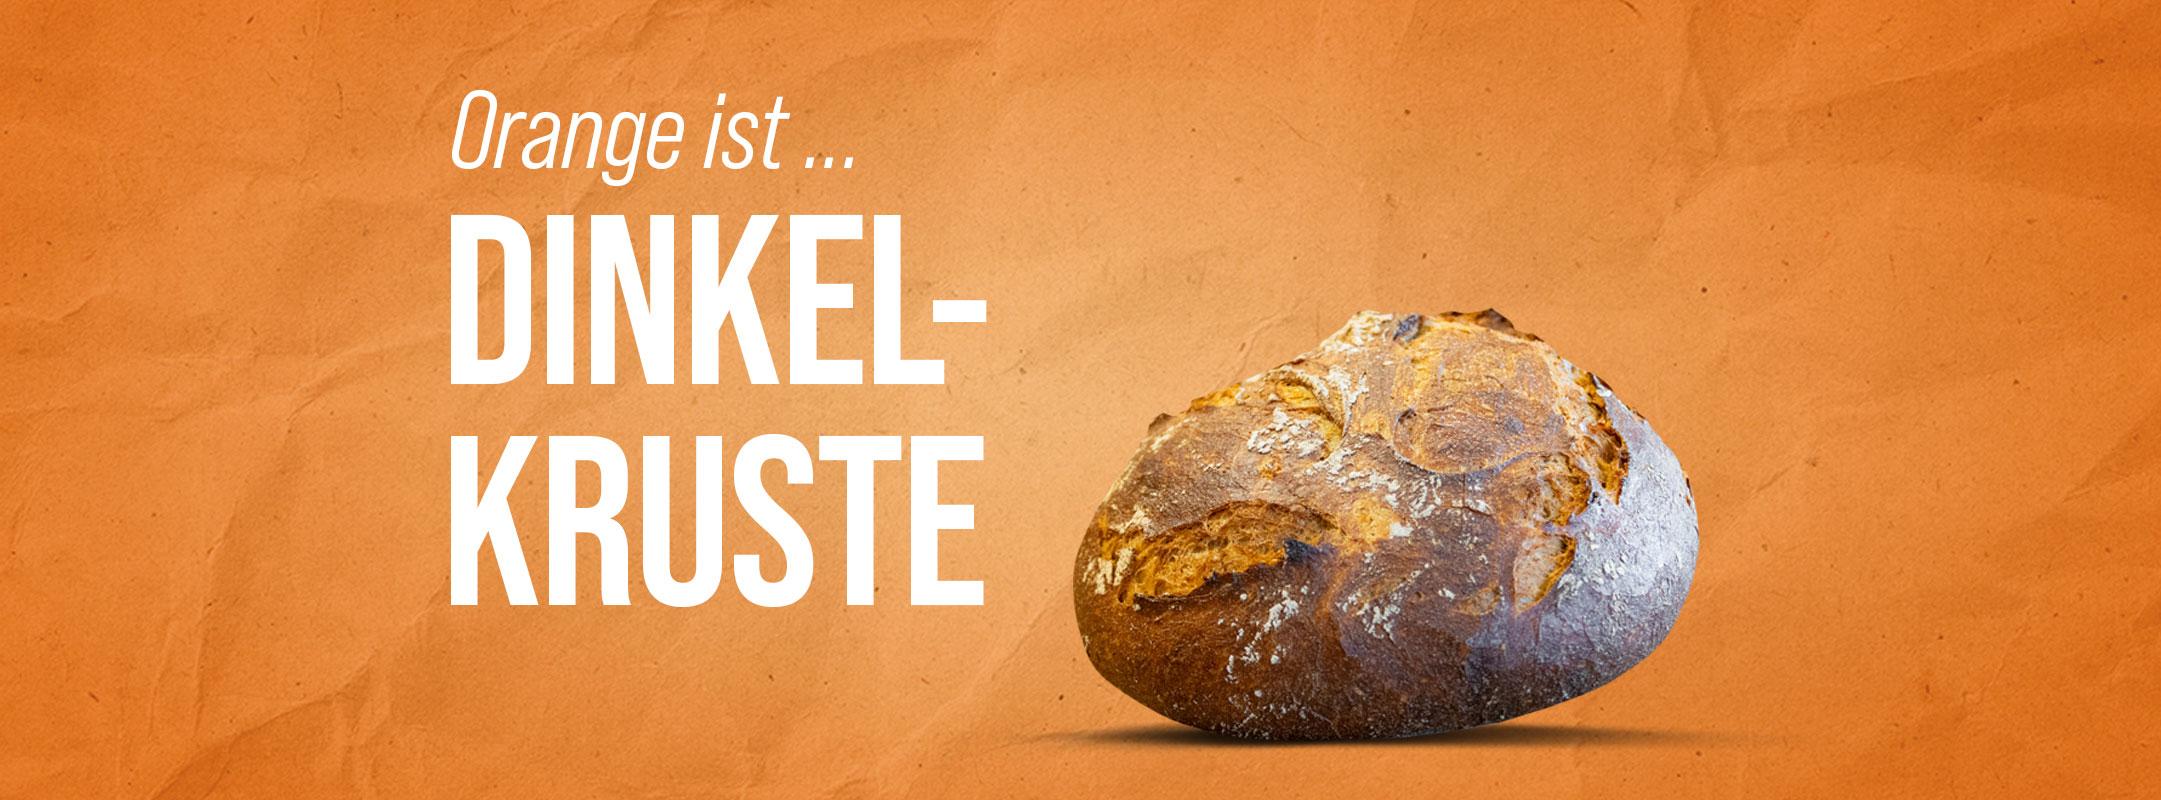 210418_Baecker_Peter_Dinkel-Krustenbrot_Header_2161x800